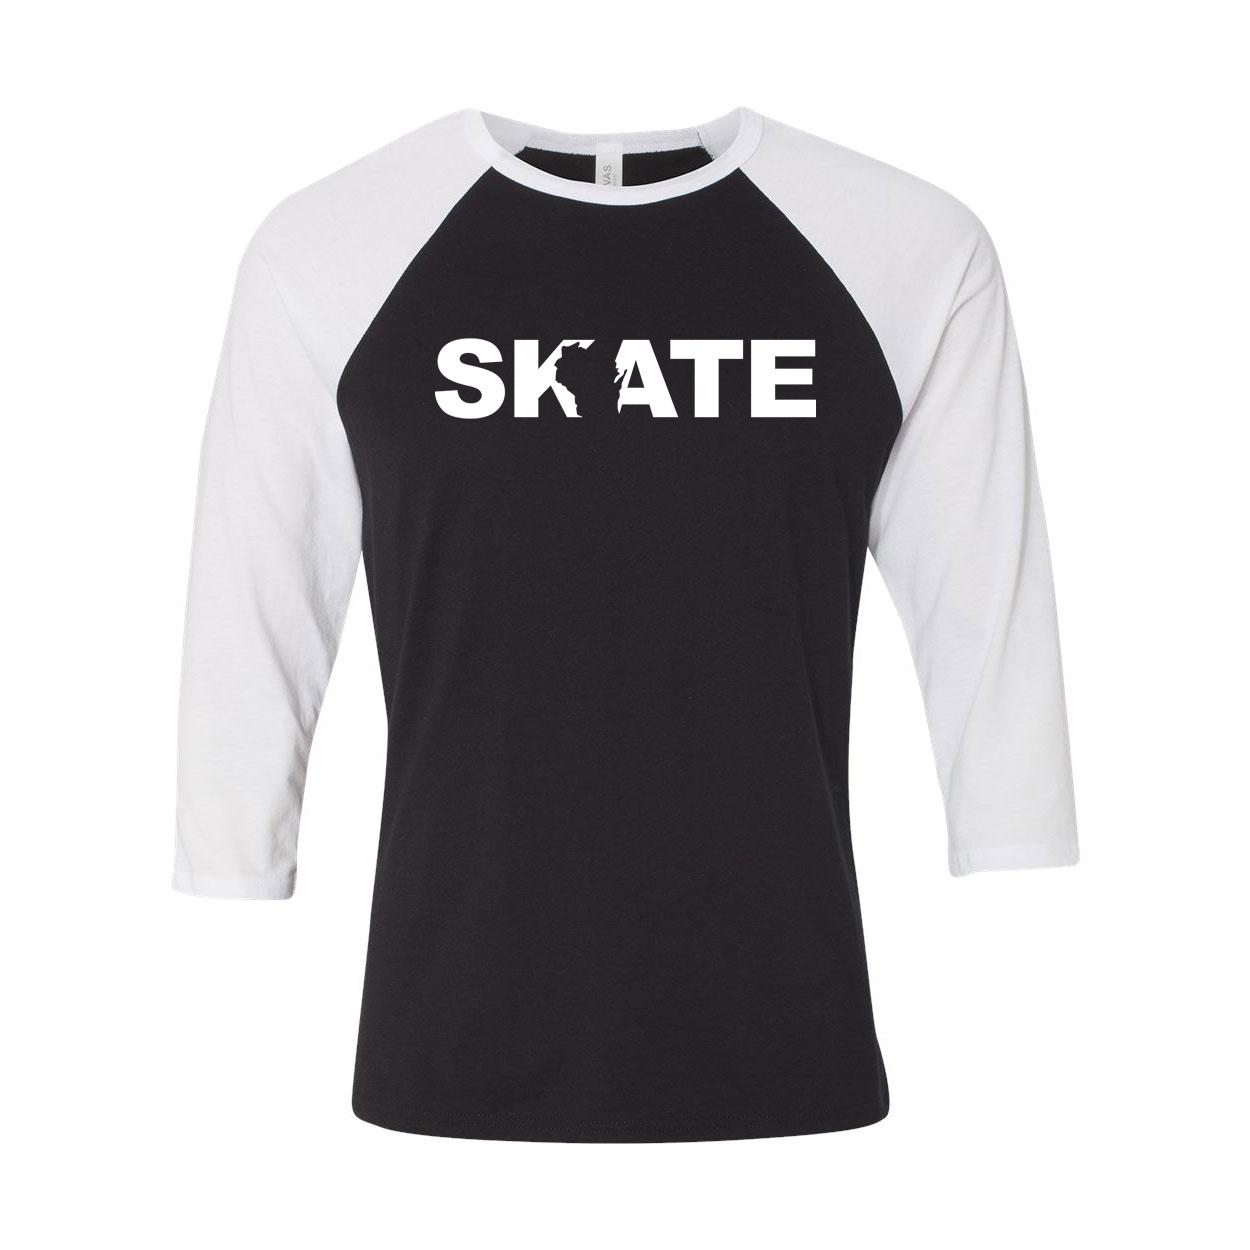 Skate Wisconsin Classic Raglan Shirt Black/White (White Logo)